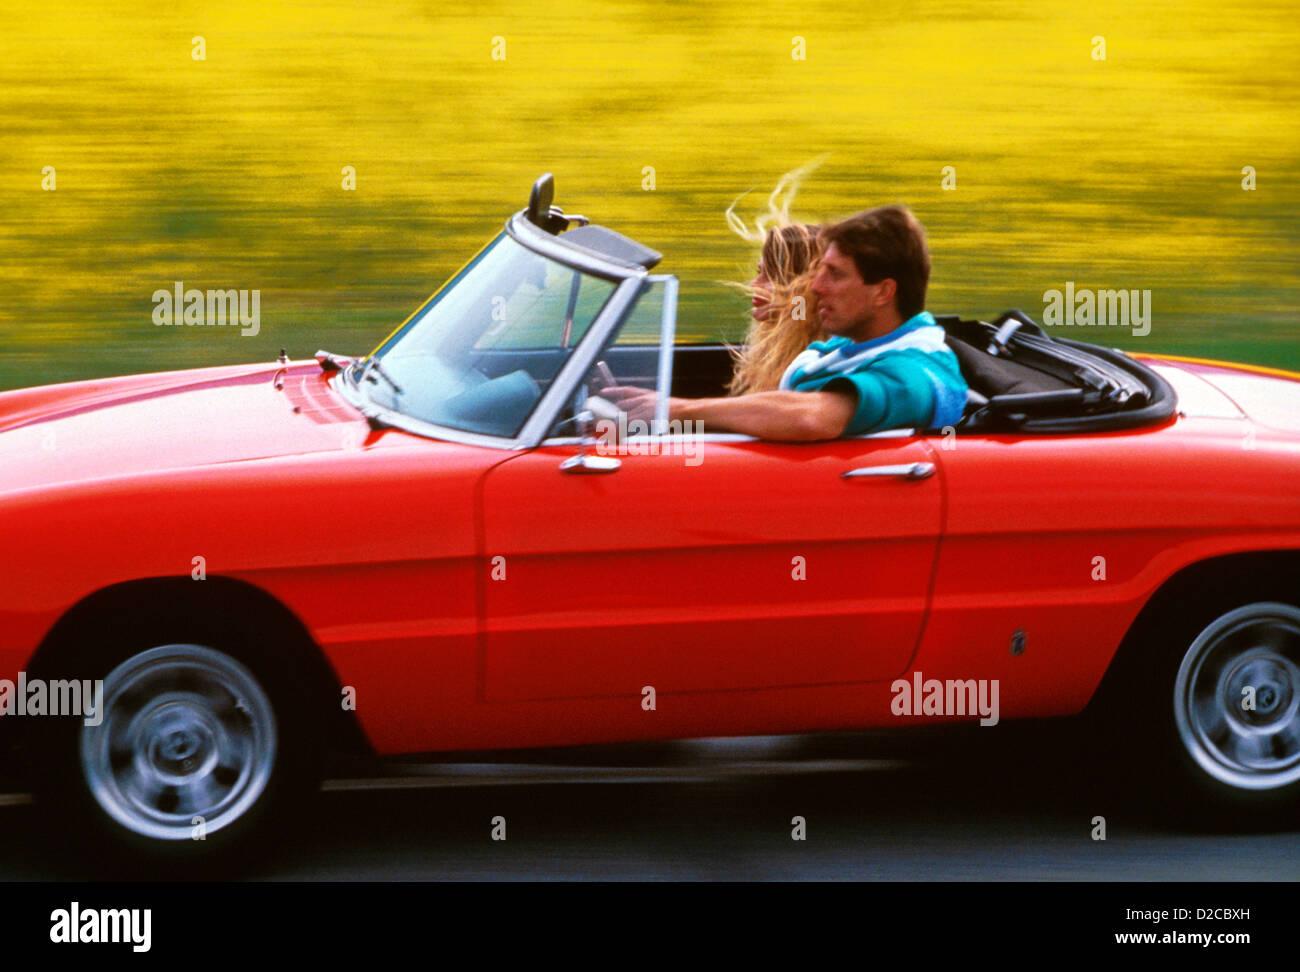 Paar Alfa Romeo Cabrio fahren. Stockbild